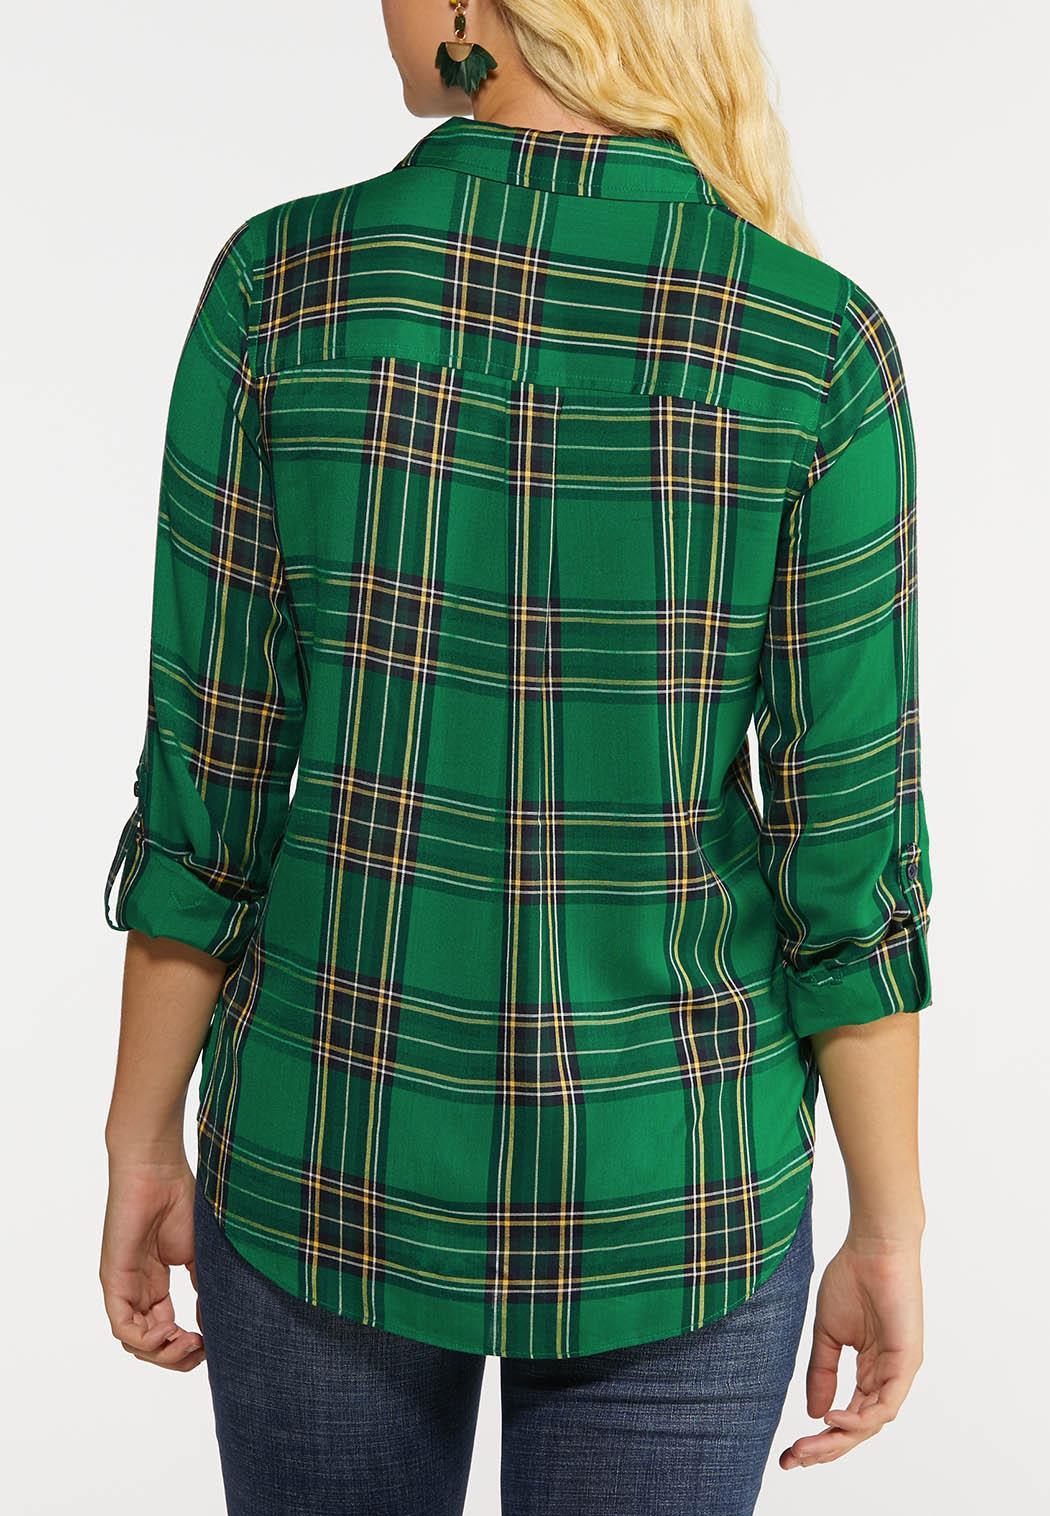 Forest Plaid Shirt (Item #43999498)